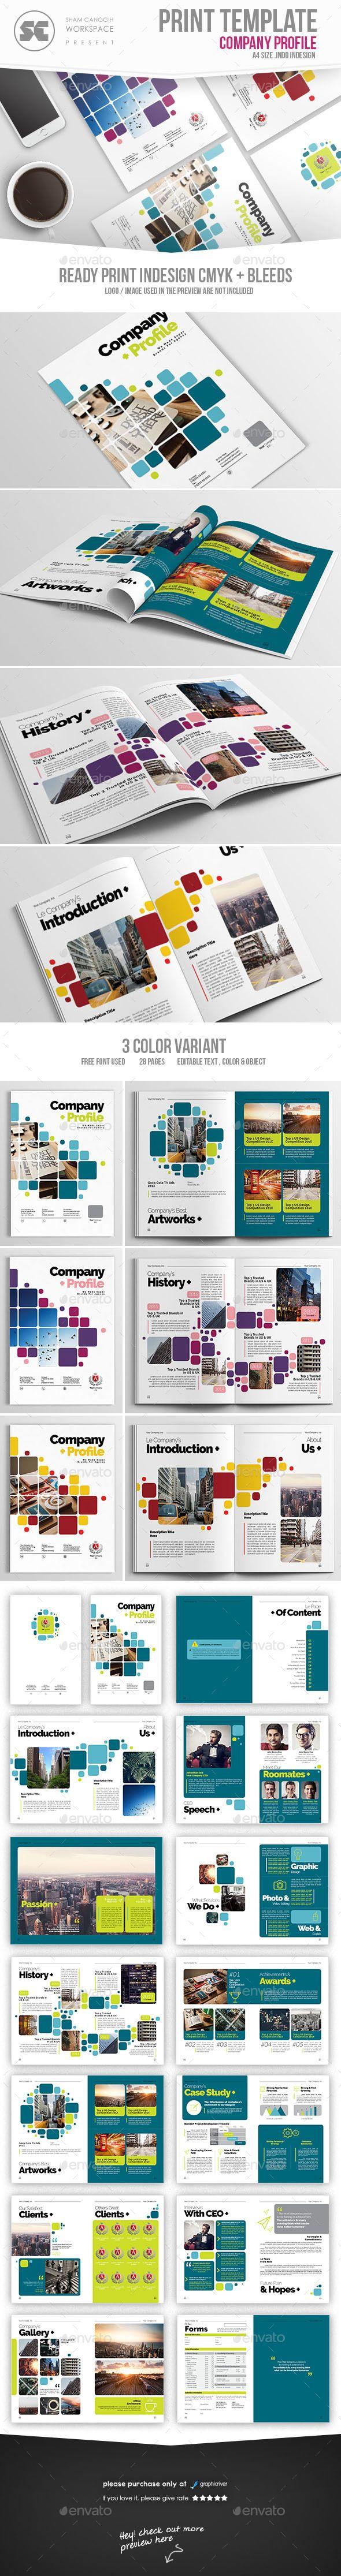 #Company Profile - Corporate #Brochures Download here: https://graphicriver.net/item/company-profile/17354491?ref=alena994